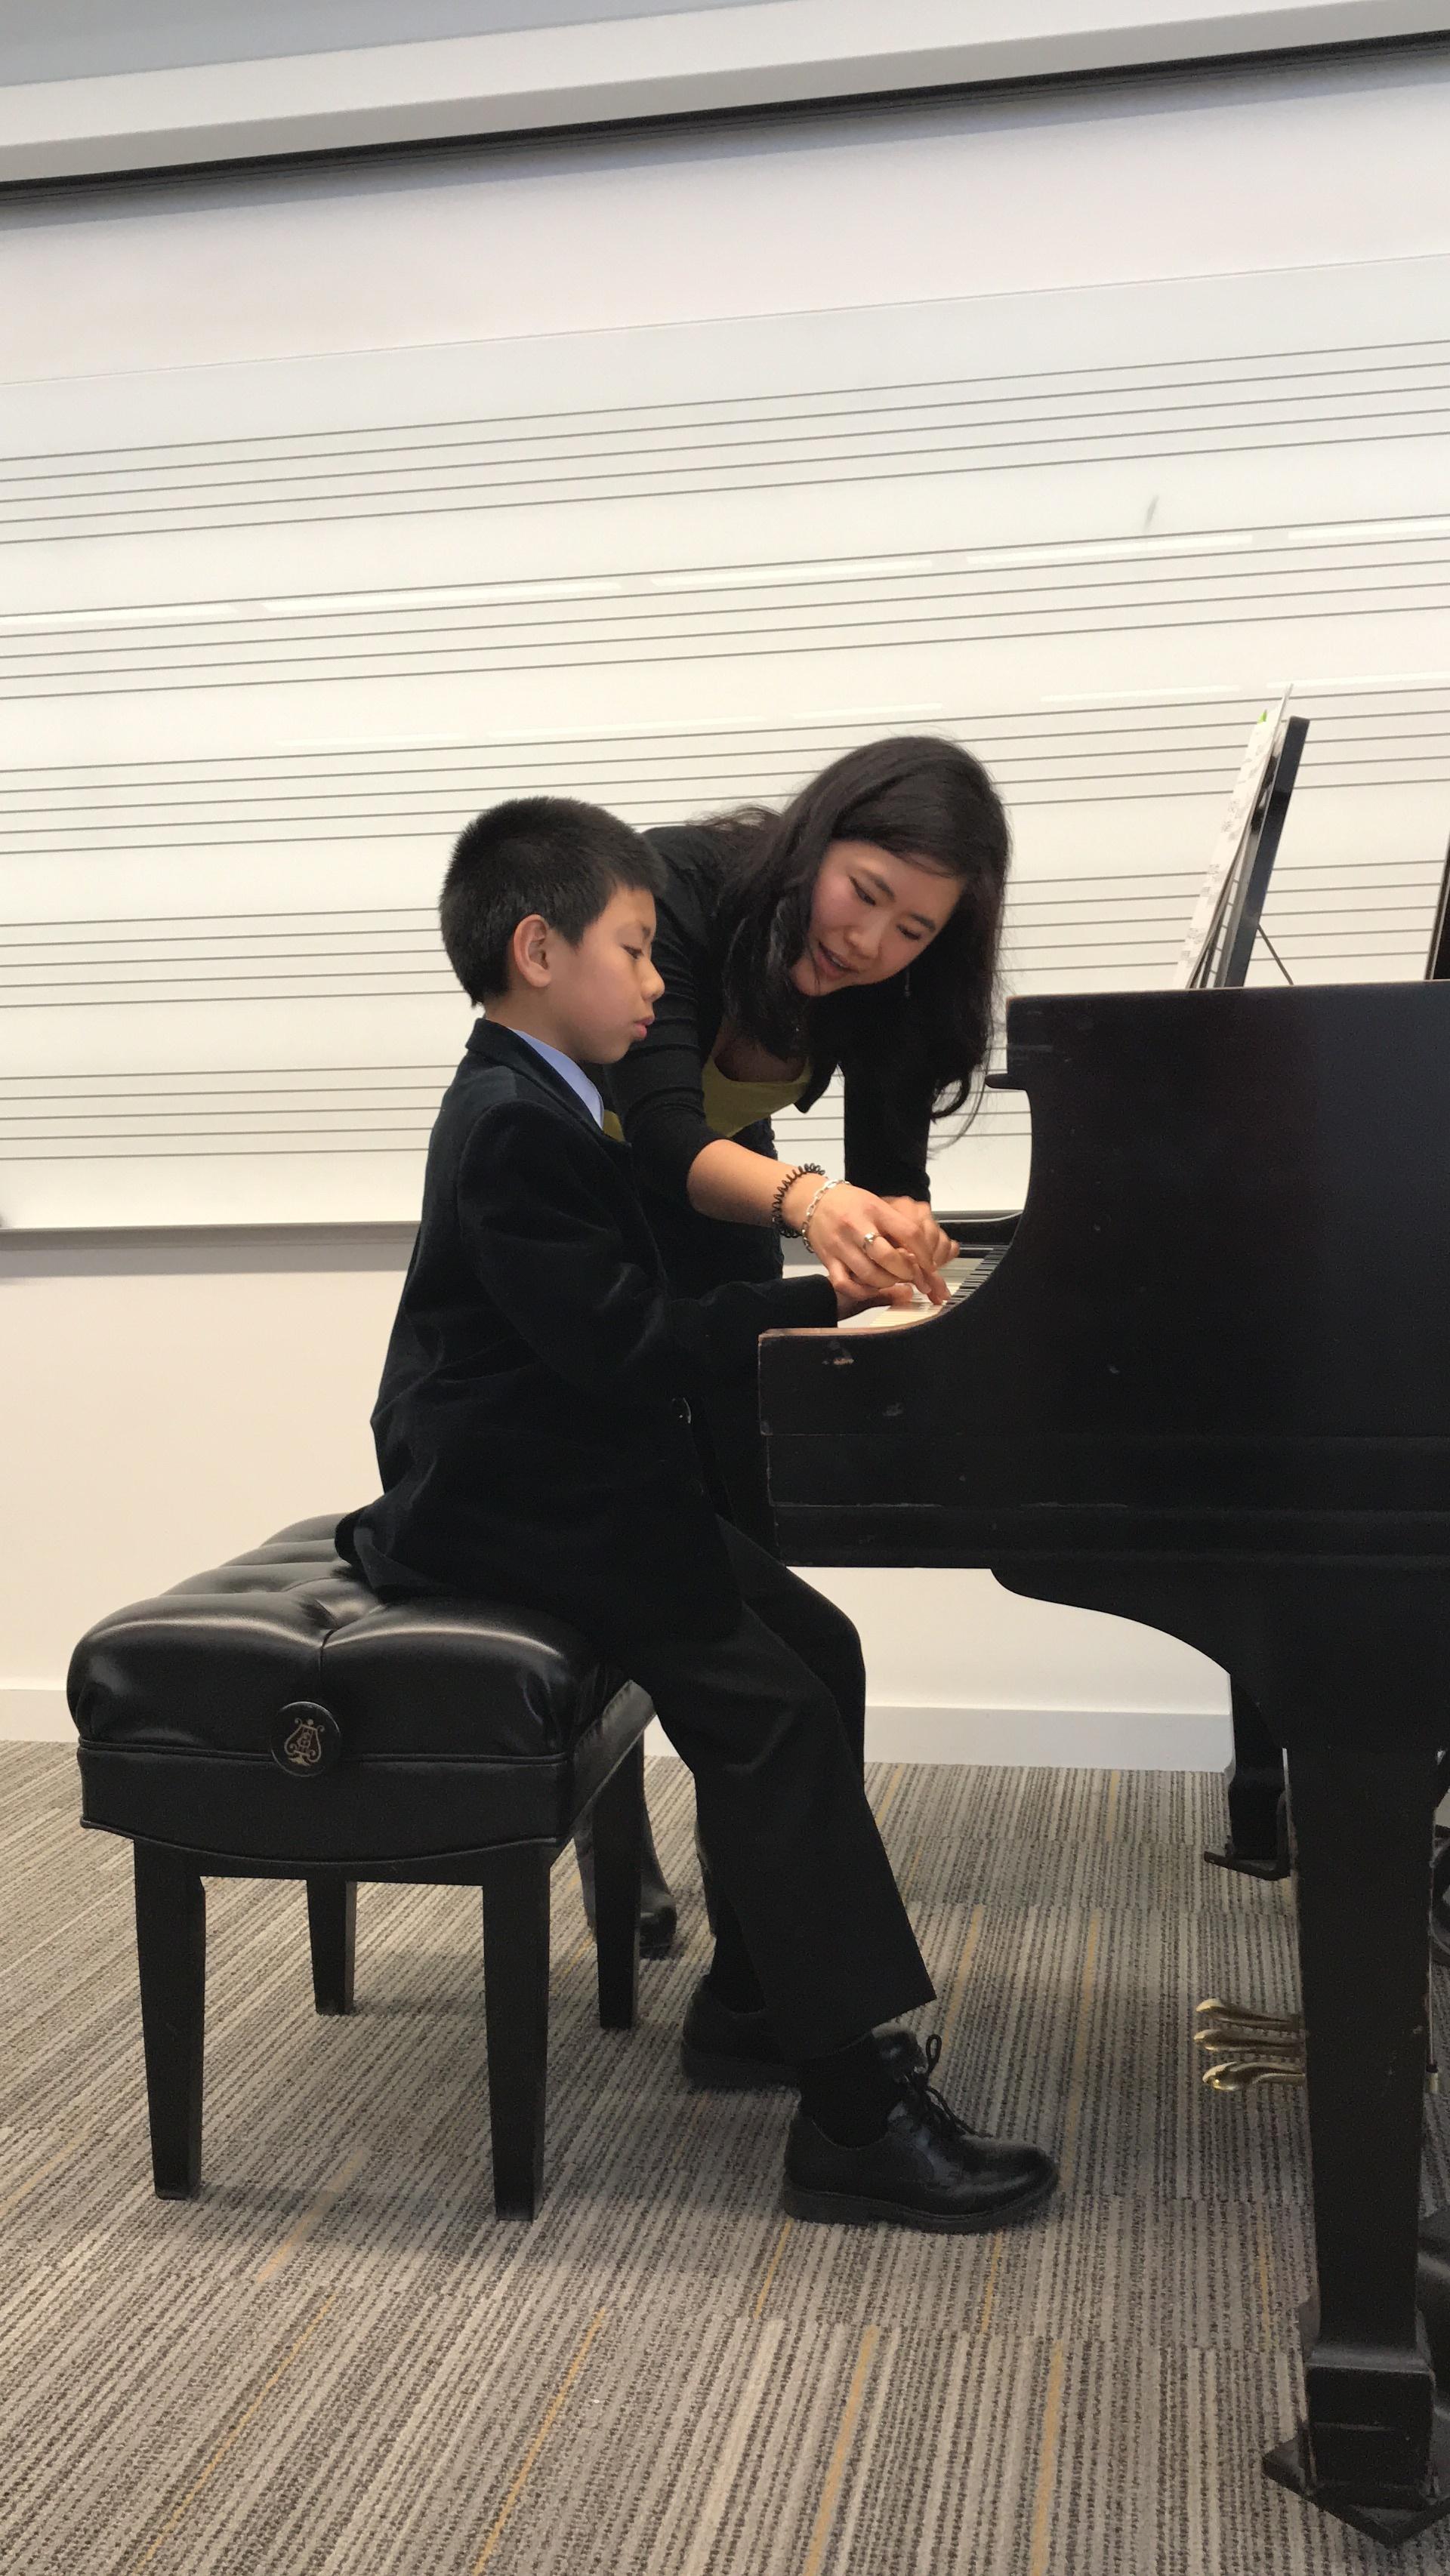 Masterclass at the UIowa Pre-College Piano Conservatory (Iowa City, IA)